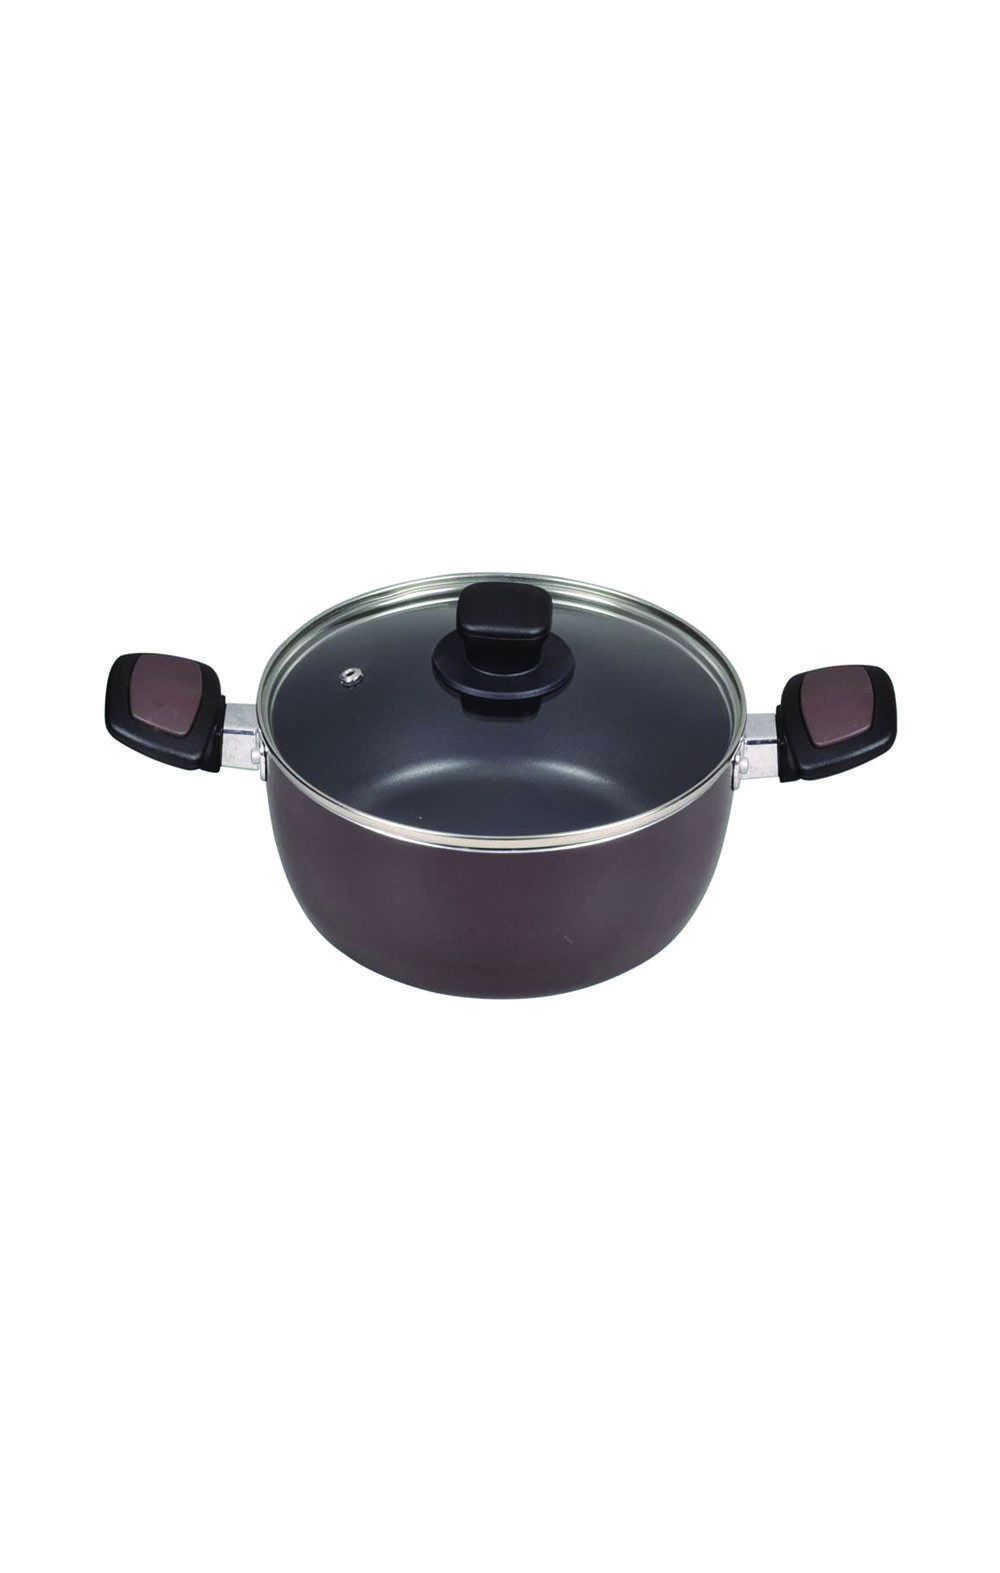 Pearl Metal HB-1669 Two-Handed Pot 20 cm قدر مع غطاء بايركس